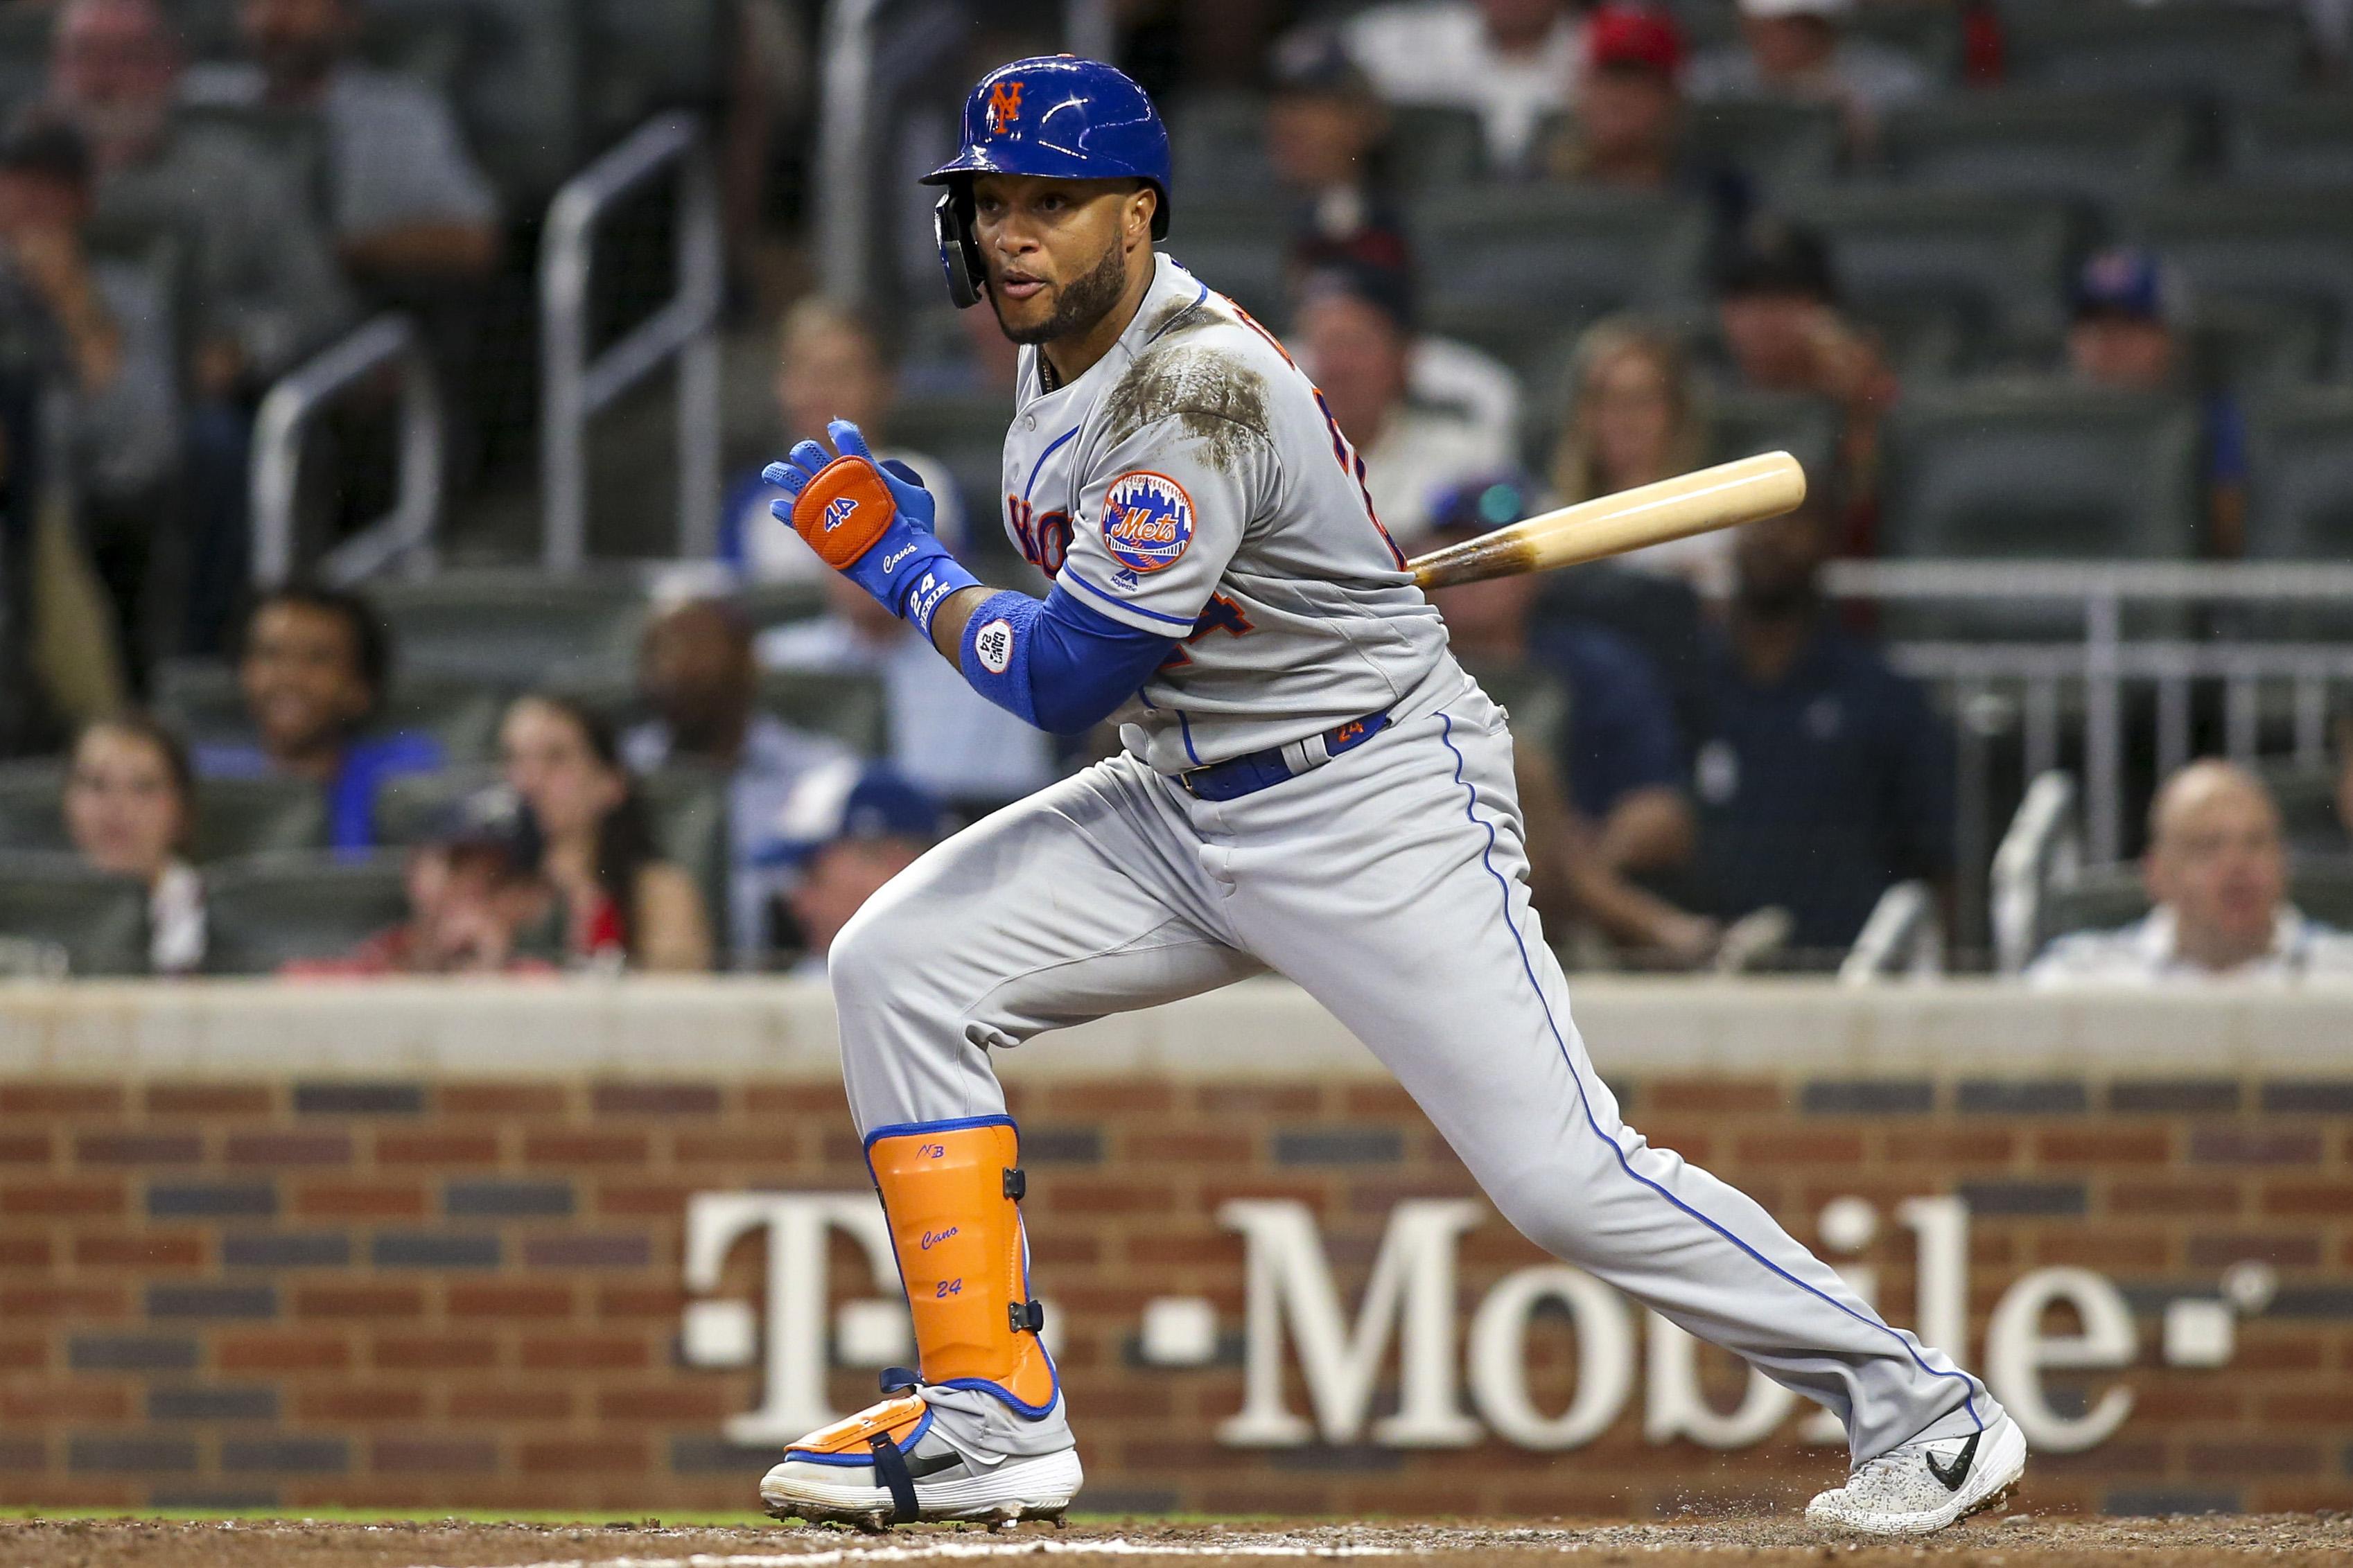 6/19/19 Game Preview: New York Mets at Atlanta Braves